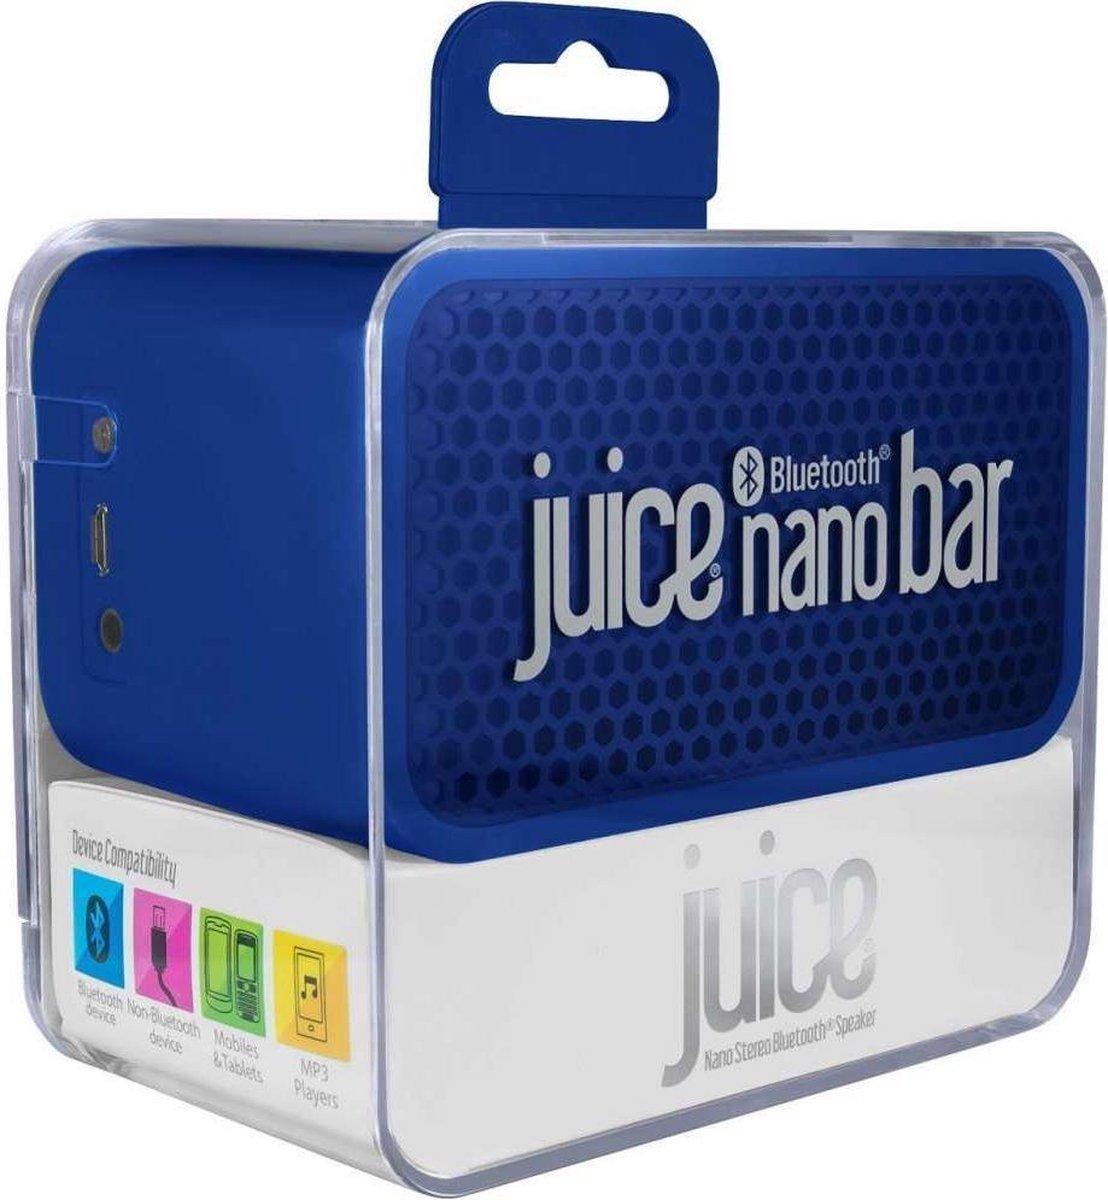 Juice Nano Bar Stereo Bluetooth Speaker - blauw